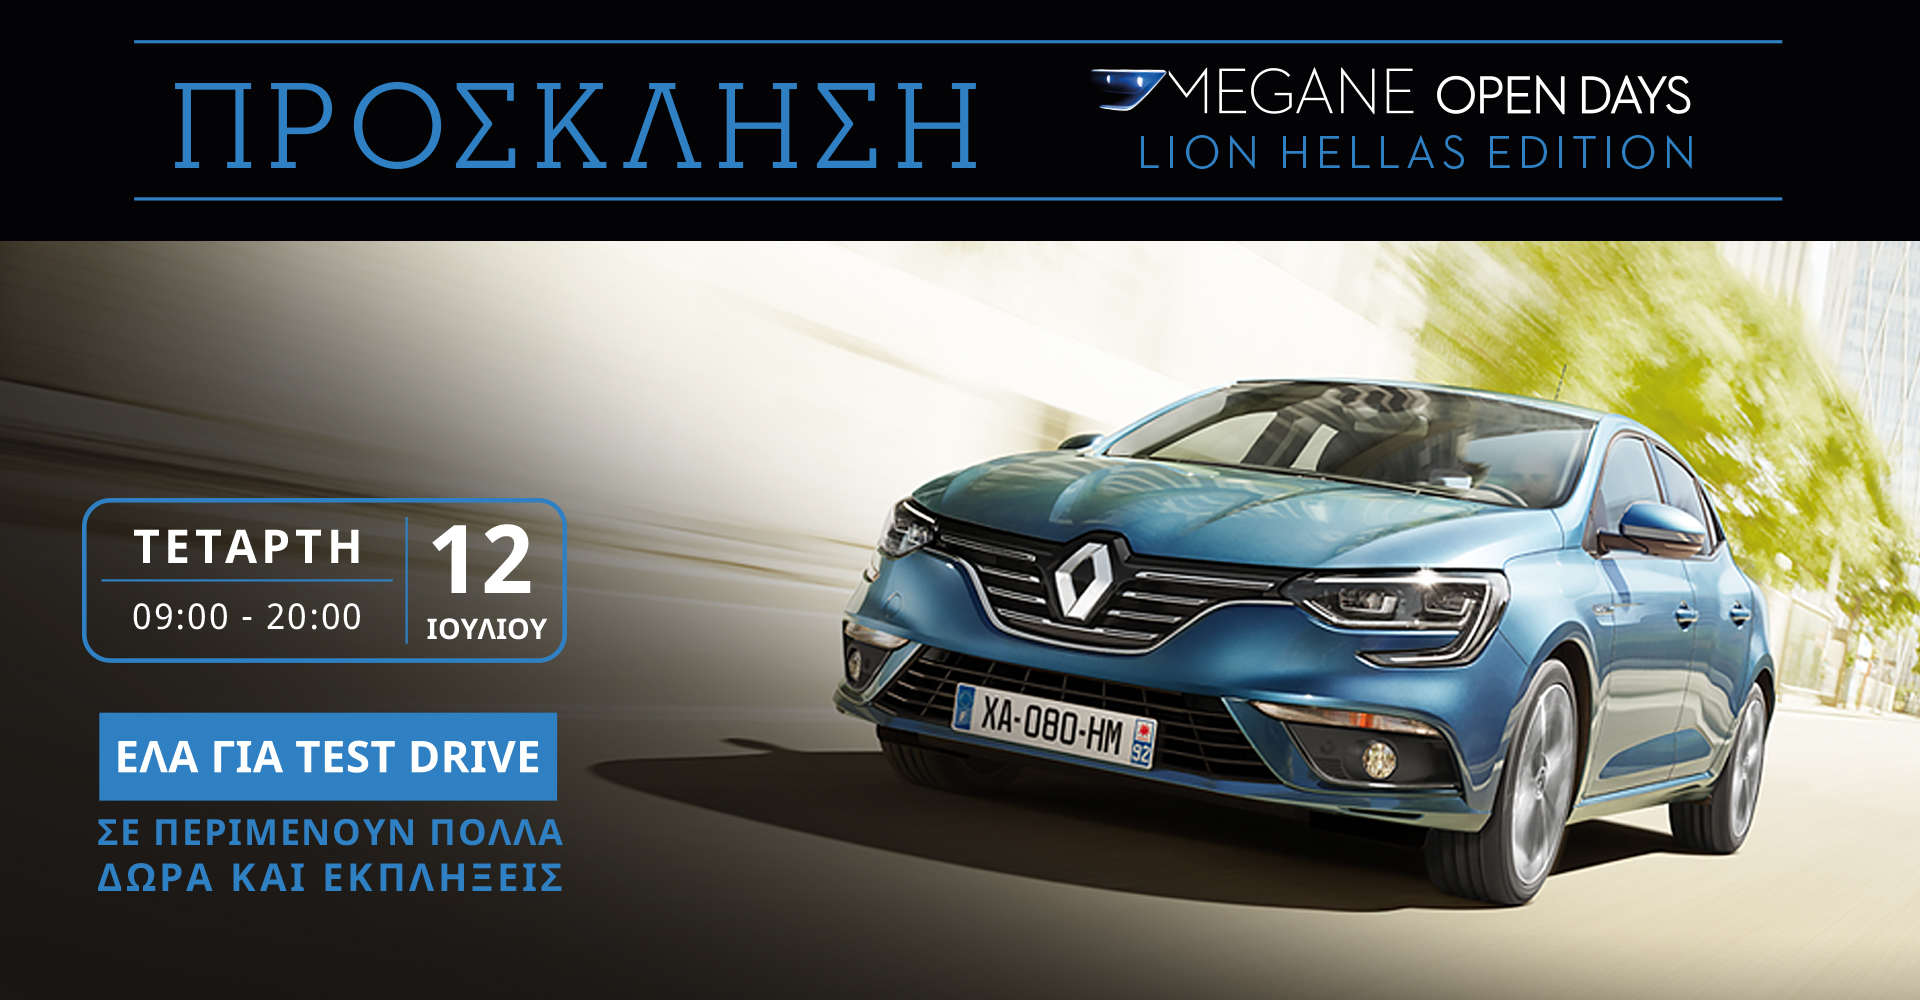 MEGANE OPEN DAYS. Η ξεχωριστή ενέργεια που δίνει την ευκαιρία στο κοινό να γνωρίσει και να οδηγήσει το νέο Renault MEGANE είναι γεγονός και η Lion Ελλάς το γιορτάζει με ένα ξεχωριστό event με πολλές εκπλήξεις την Τετάρτη 12 Ιουλίου. Δυναμικό, με ξεχωριστό χαρακτήρα, οδηγικό ταπεραμέντο που συναρπάζει και τεχνολογία που μέχρι σήμερα συναντούσε κανείς μόνο σε μοντέλα μεγαλύτερων κατηγοριών, το νέο Renault MEGANE ήρθε για να κυριαρχήσει και οι MEGANE OPEN DAYS αποτελούν την καλύτερη αφορμή για να ανακαλύψει κανείς από κοντά το νέο μοντέλο. Την Τετάρτη 12 Ιουλίου, στα πλαίσια των MEGANE OPEN DAYS, η Lion Ελλάς, Εξουσιοδοτημένος Διανομέας και Επισκευαστής Renault & Dacia, έχει ετοιμάσει ένα ξεχωριστό event για να γιορτάσει αυτό το μοναδικό δεκαήμερο. Από τις 9 το πρωί μέχρι και τις 8 το βράδυ στην Έκθεση της Λ. Κηφισού 138-140, μια σειρά εκπλήξεων περιμένει όσους την επισκεφθούν. Εκτός από τη δυνατότητα να γνωρίσουν και να οδηγήσουν το νέο Renault MEGANE, οι επισκέπτες θα έχουν την ευκαιρία να επωφεληθούν από μοναδικές προσφορές, να κερδίσουν δώρα της Renault, ενώ τους περιμένει και μια μοναδική έκπληξη που θα τη ζήσουν μαζί με το νέο Renault MEGANΕ! Για περισσότερες πληροφορίες σχετικά με την εκδήλωση της 12ης Ιουλίου, αλλά και συνολικότερα για τις MEGANE OPEN DAYS στη Lion Ελλάς, το κοινό μπορεί να επικοινωνεί με το τηλέφωνο 210-5706860 ή να επισκεφθεί τον ιστότοπο www.lion.renault-net.gr/meganeopendays